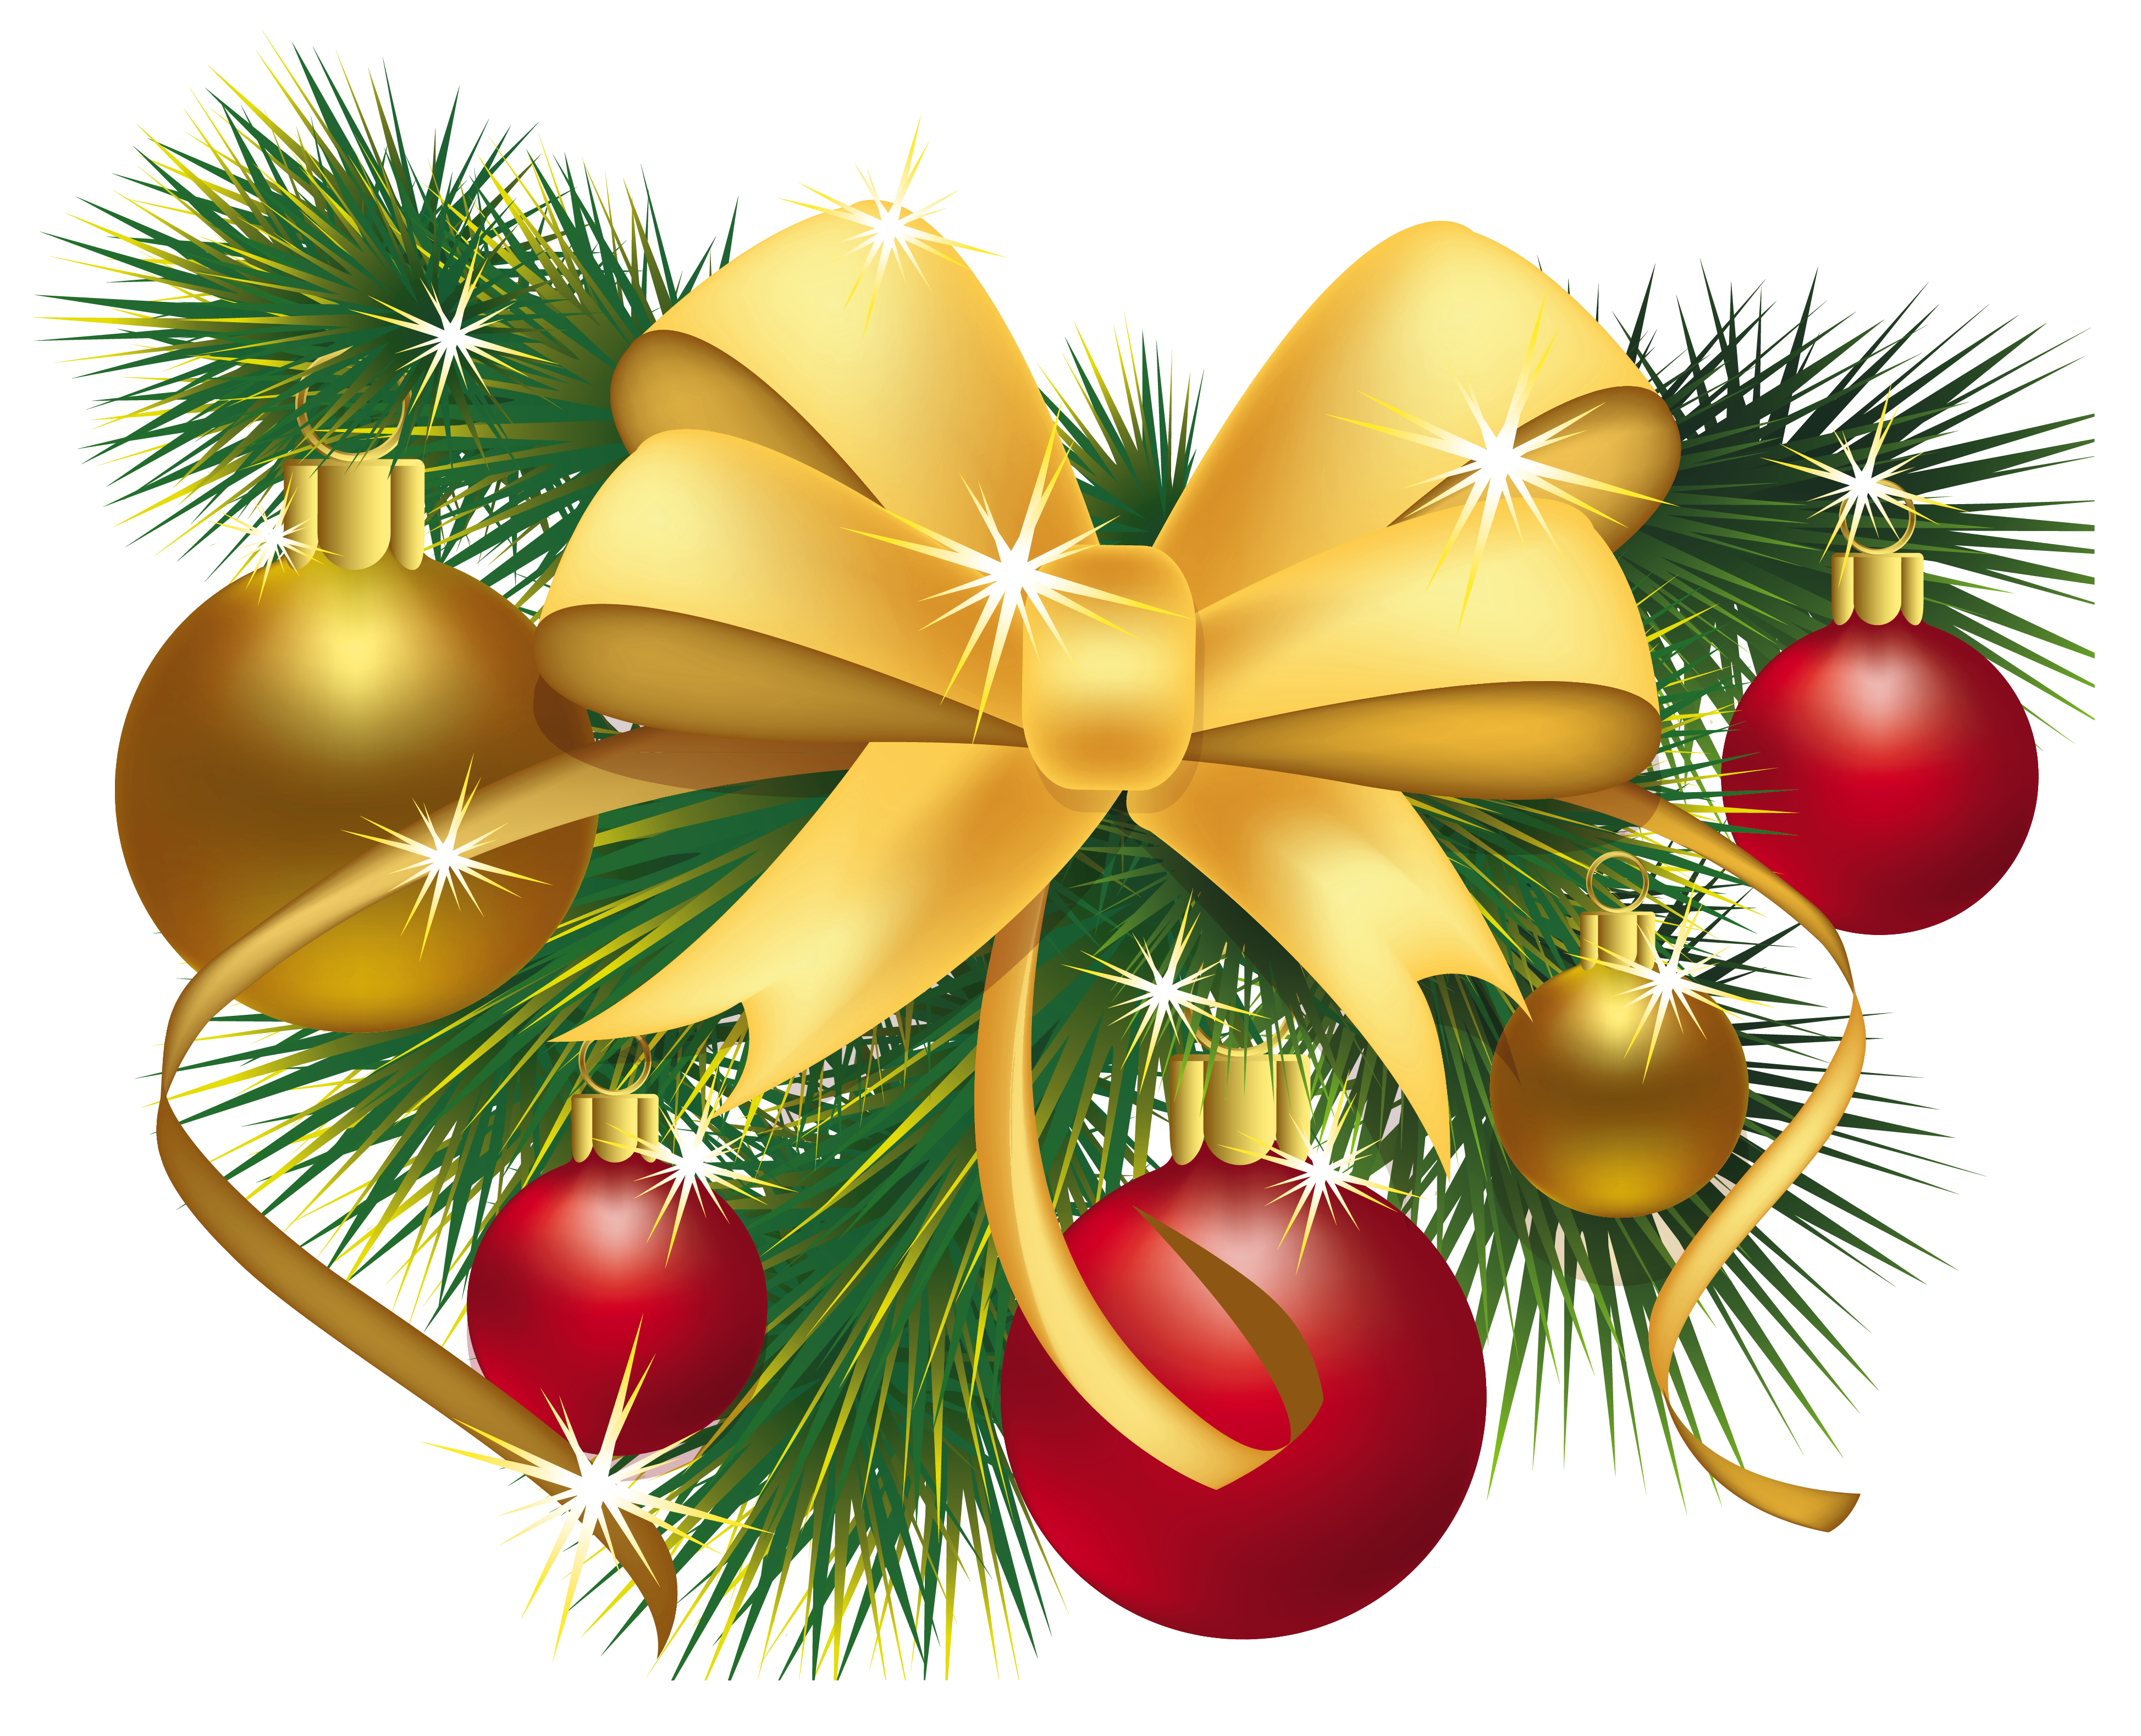 Christmas Ornament PNG - 11118